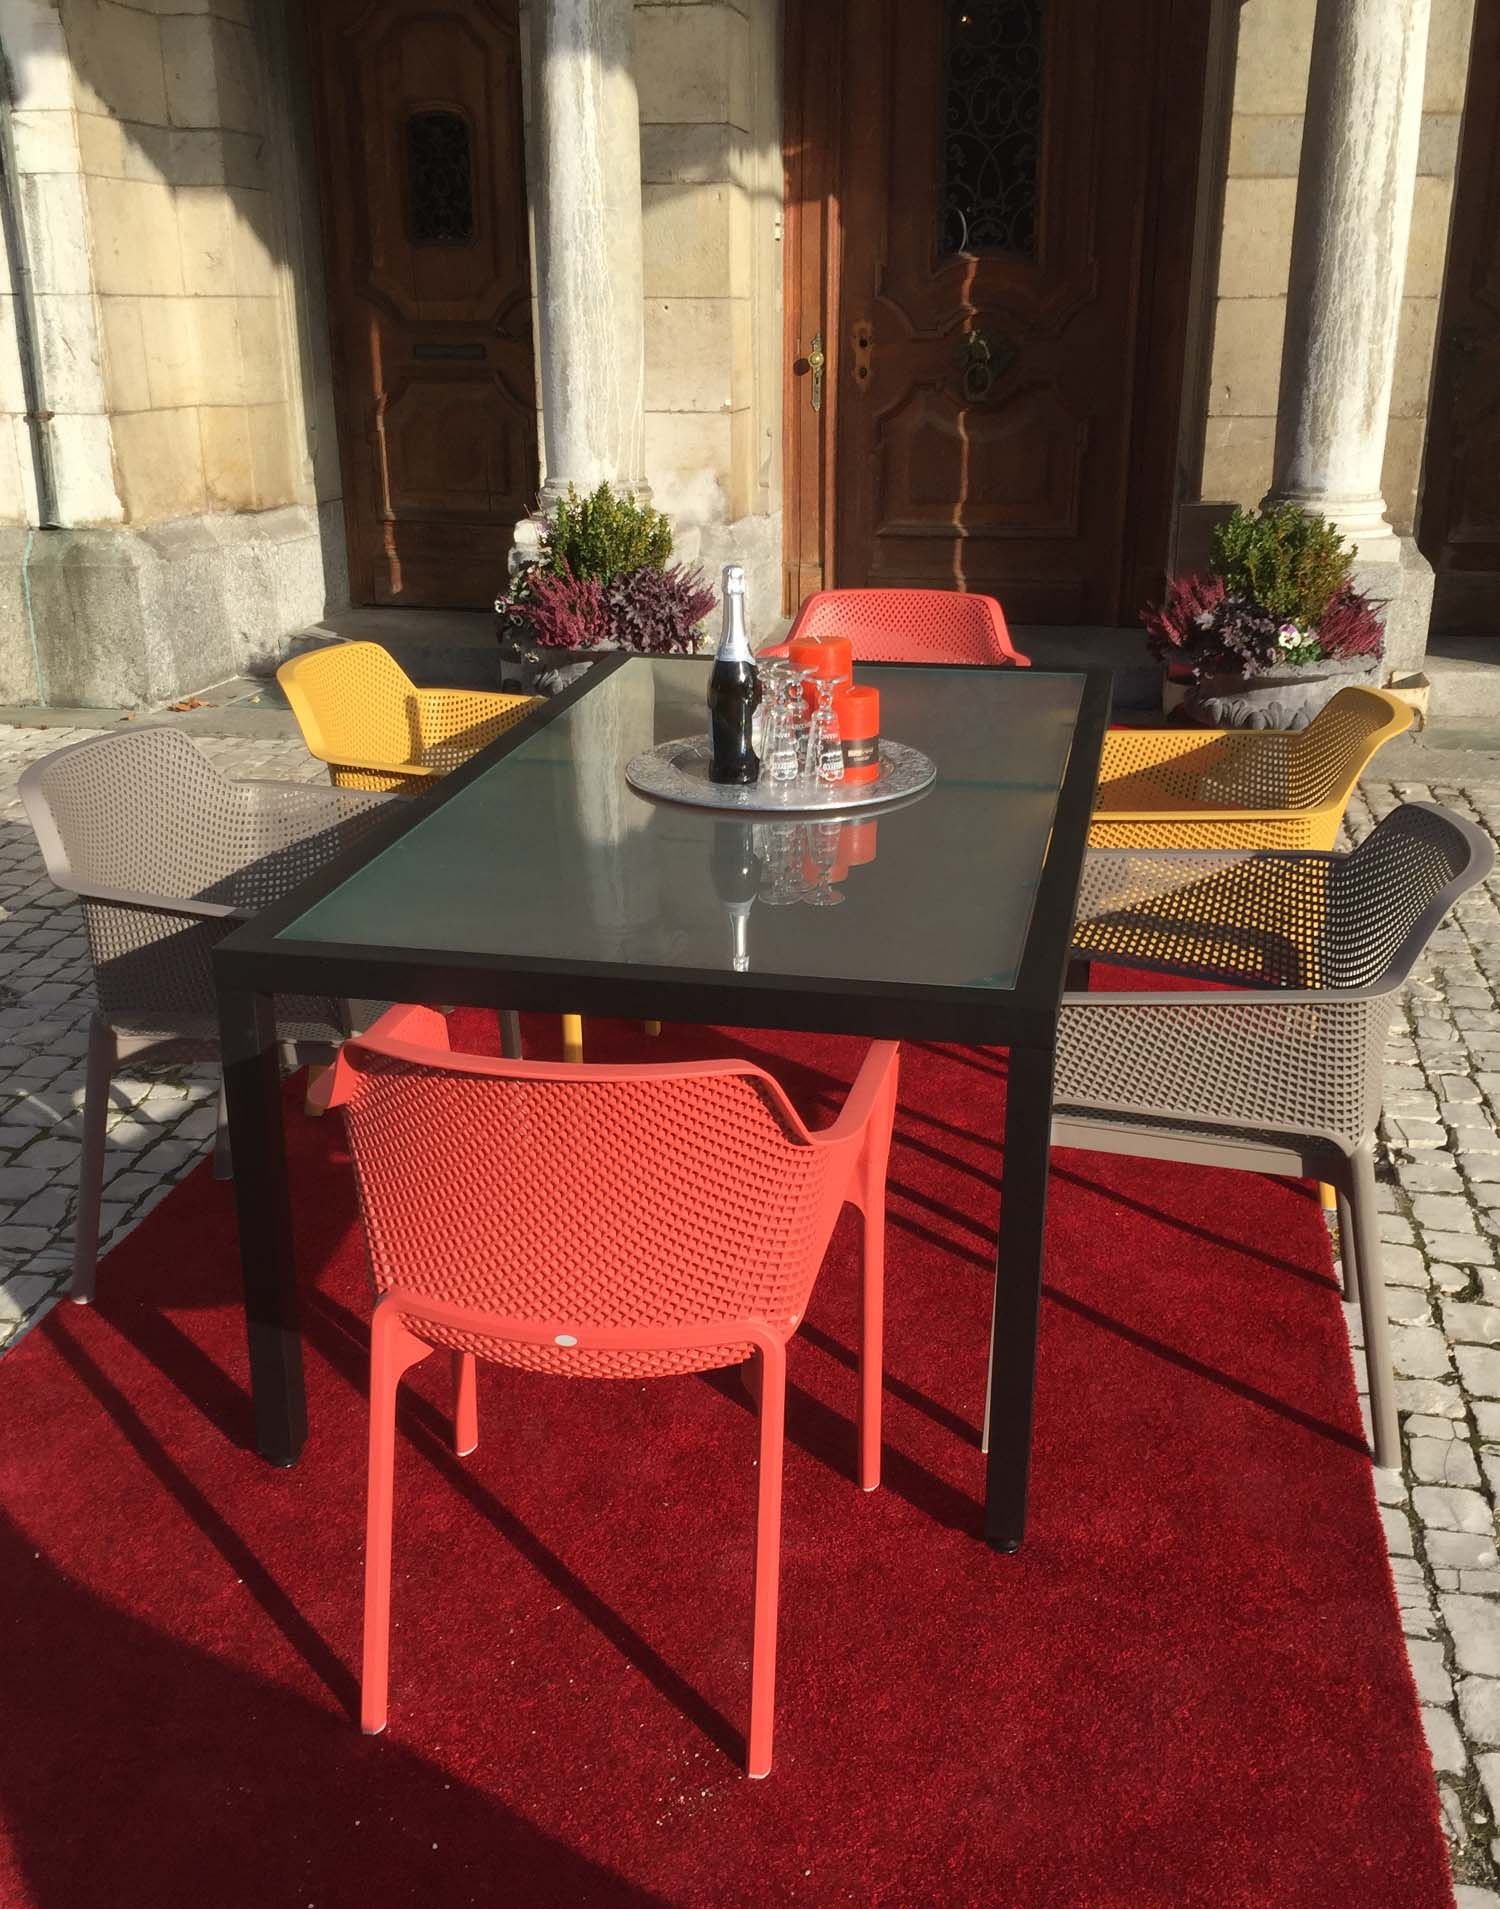 sunzone gartenmoebel set 9. Black Bedroom Furniture Sets. Home Design Ideas